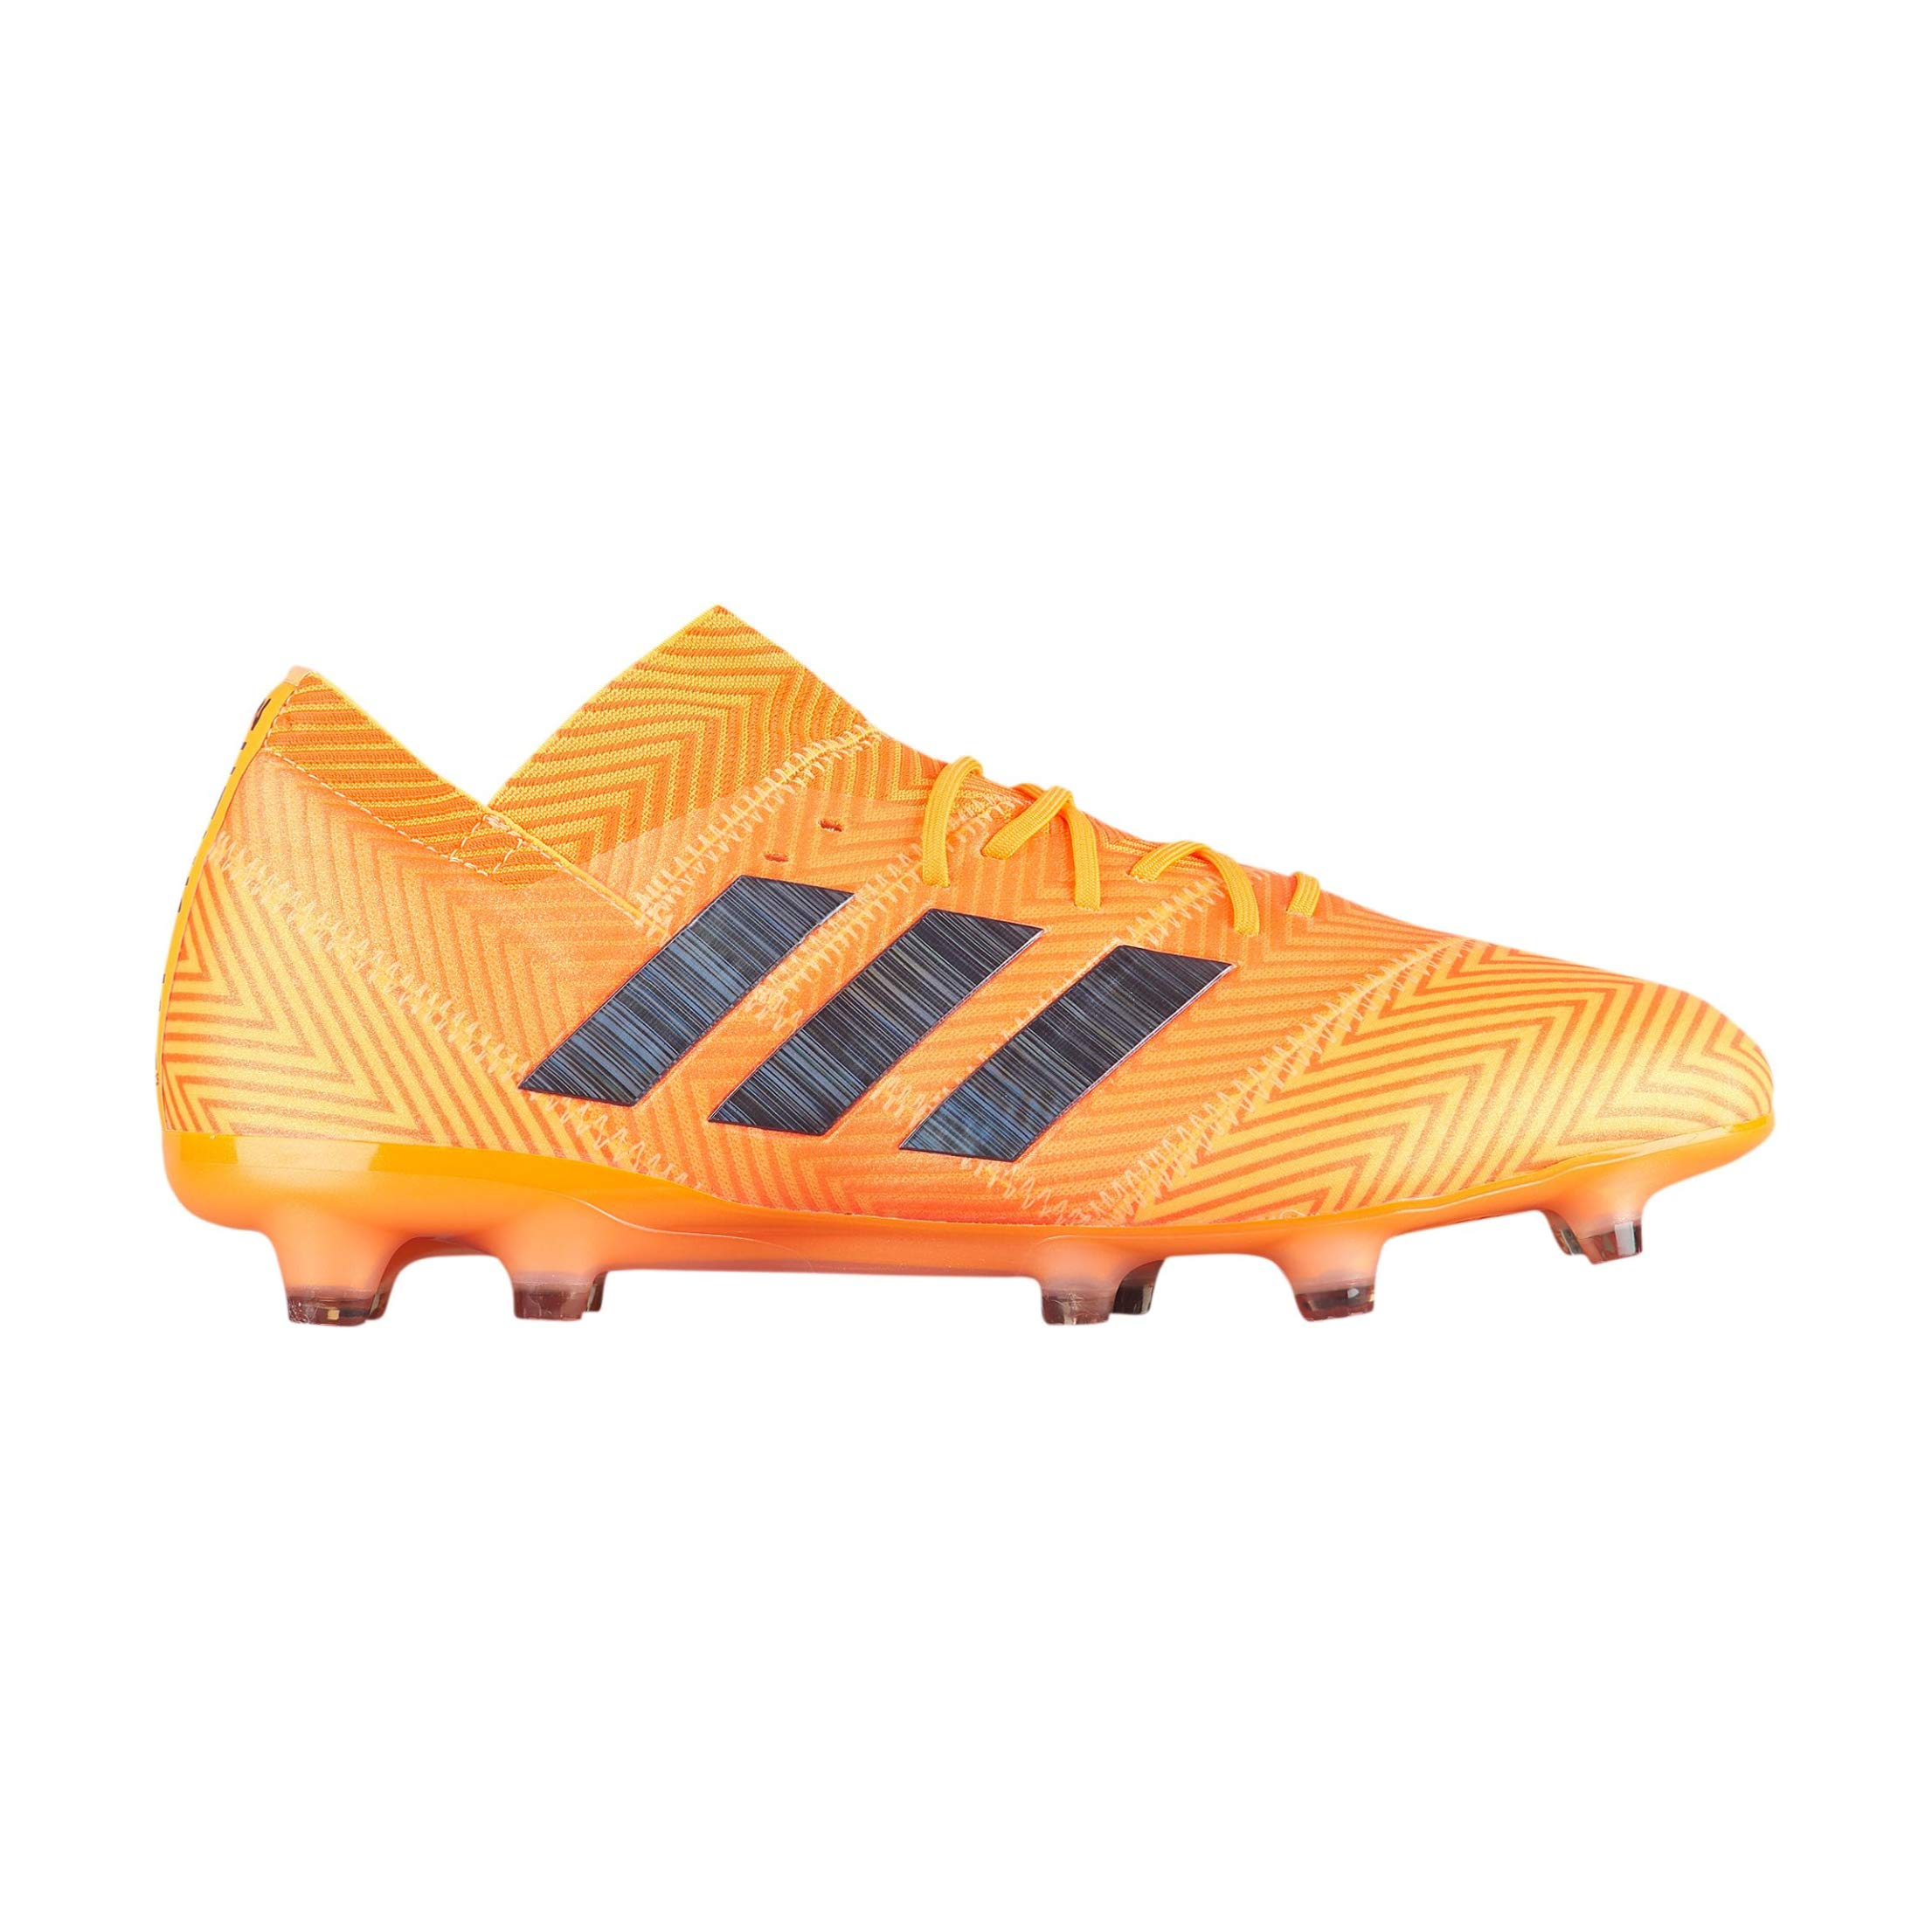 64686fe15aa Galleon - Adidas Nemeziz 18.1 FG Cleat - Men s Soccer 6.5 Emode